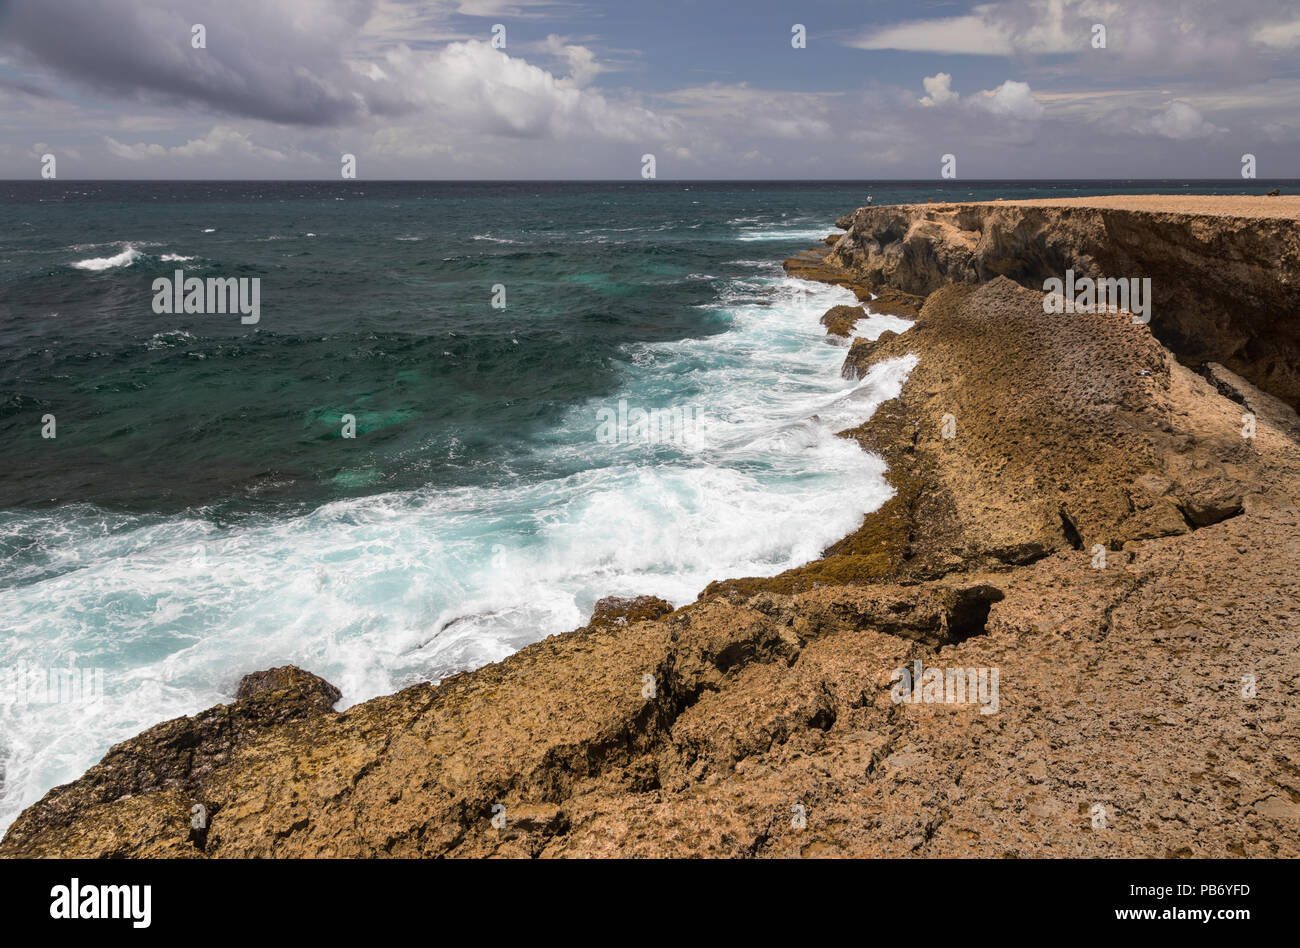 Ocean Waves crashing in the rocky coastline of Arikok National Park, Aruba, Caribbean Stock Photo